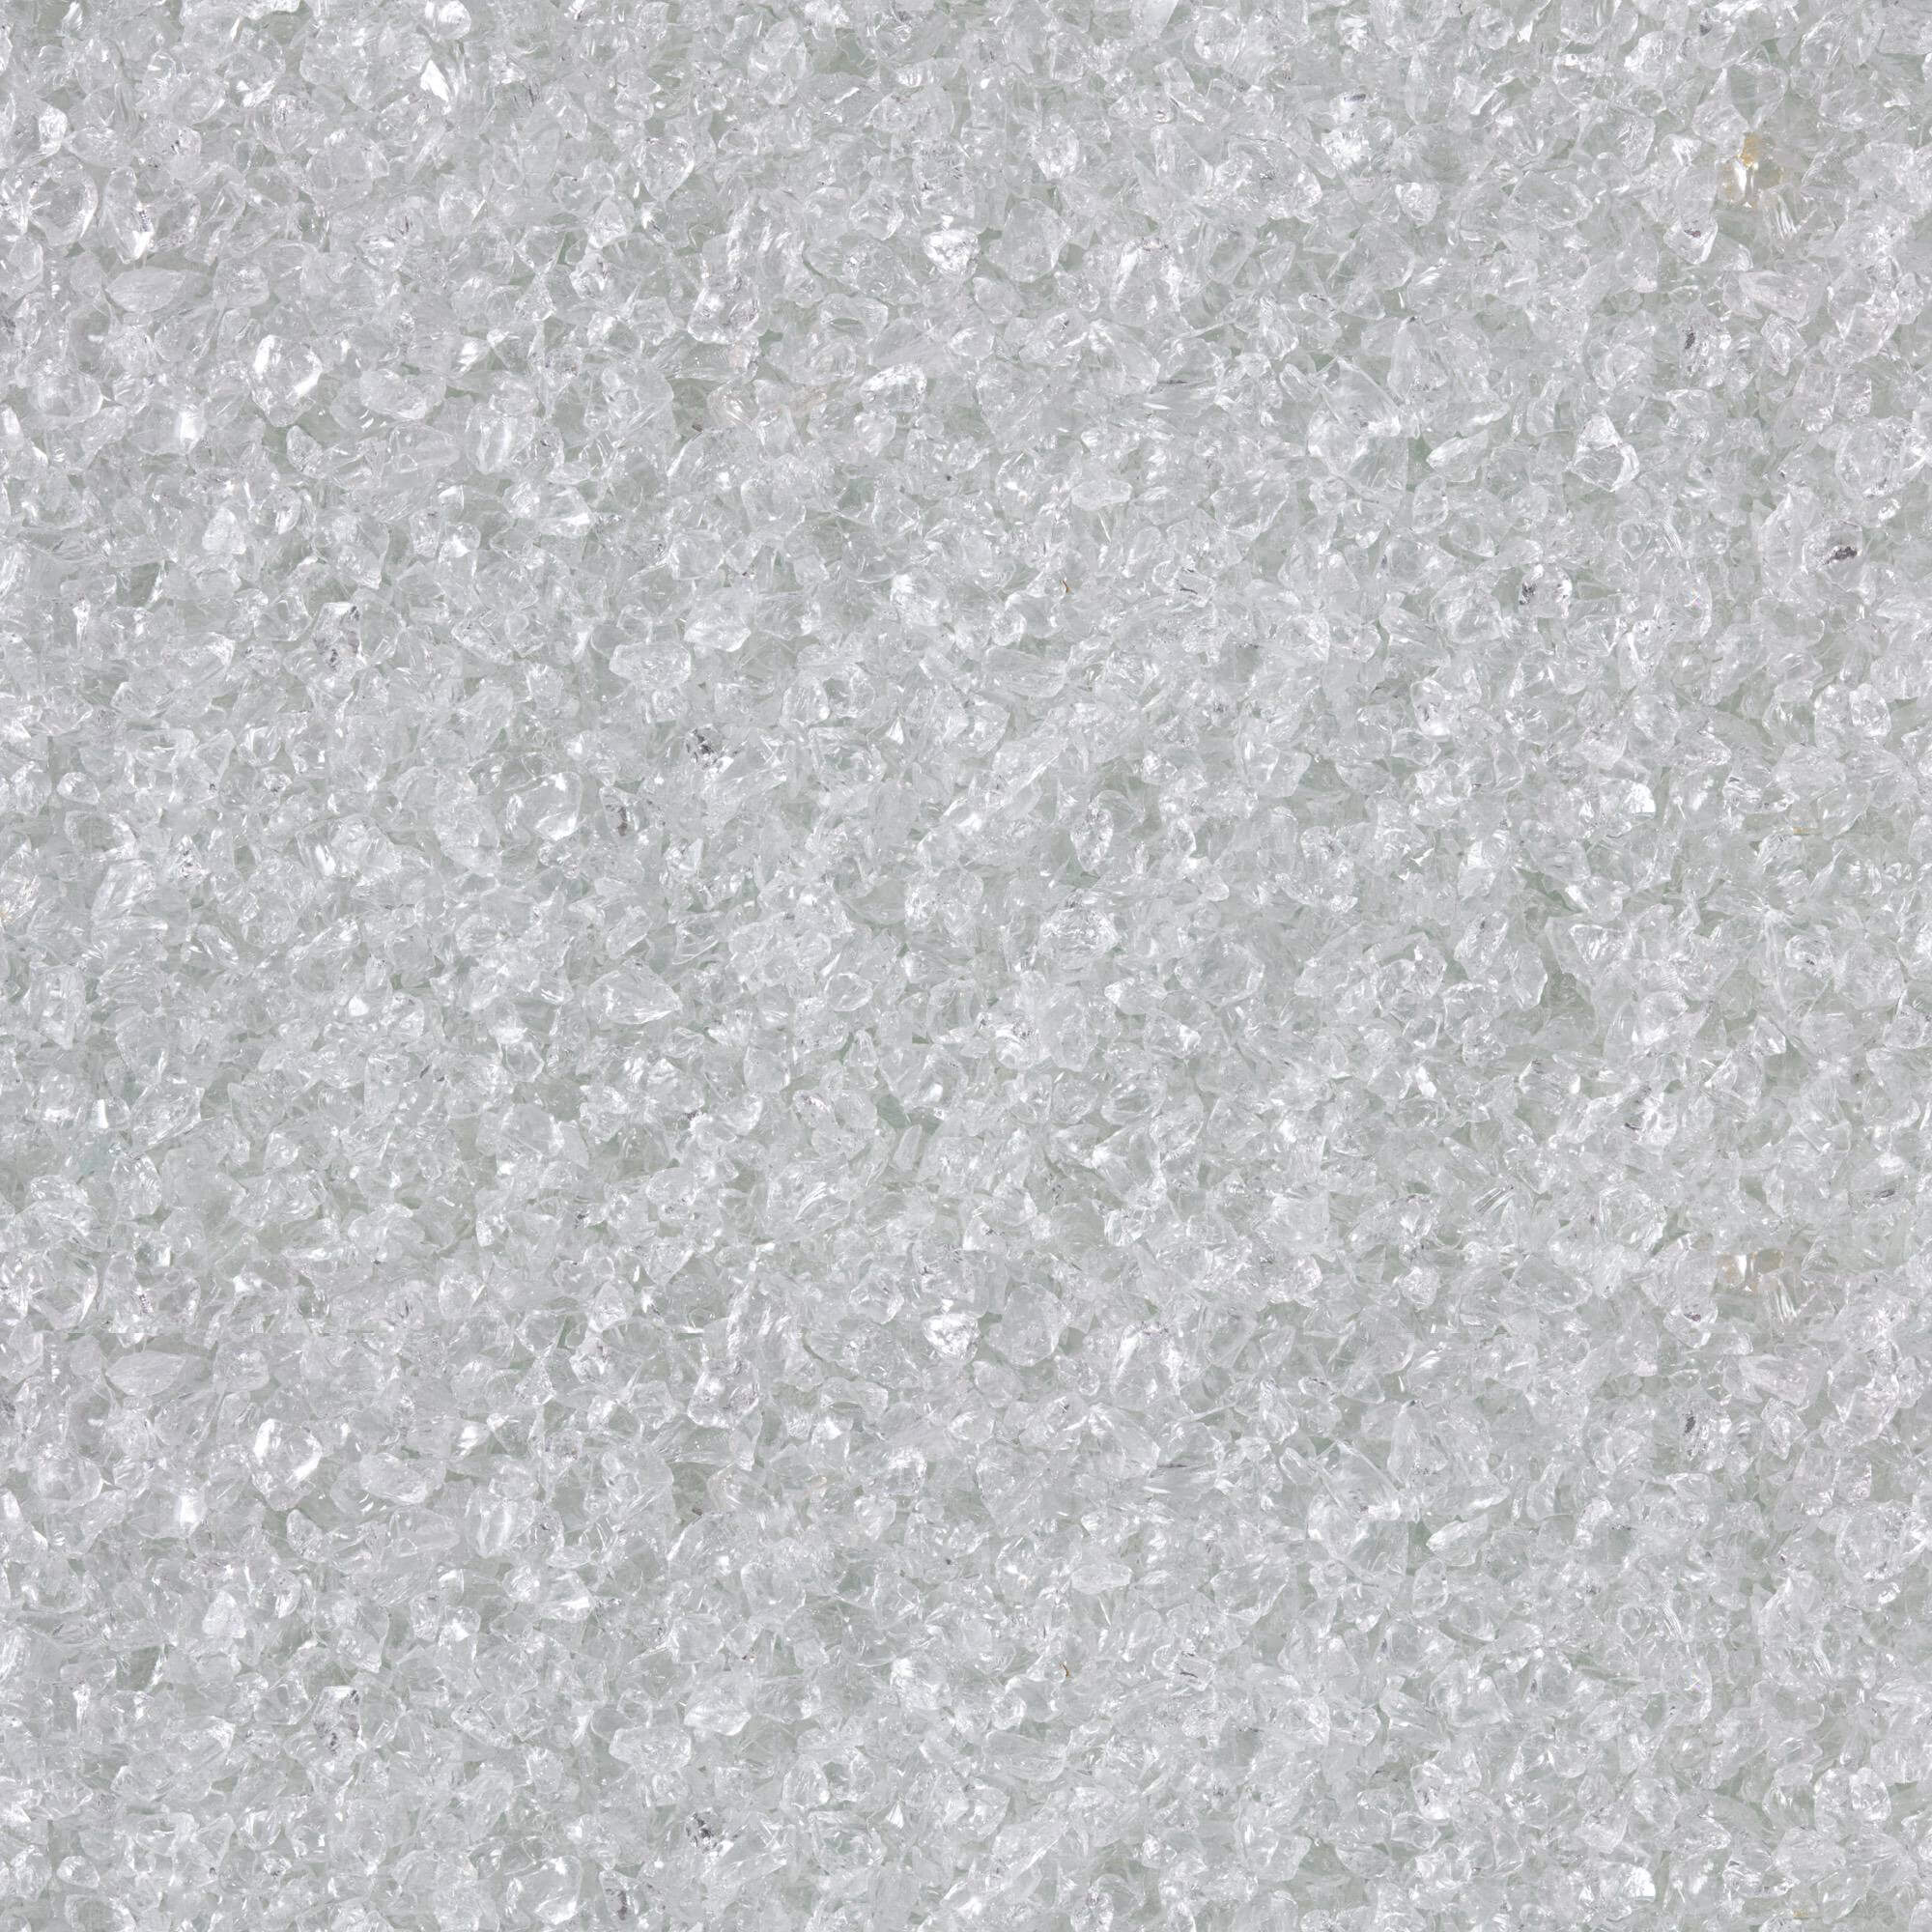 CRUSHED GLASS 1-3MM